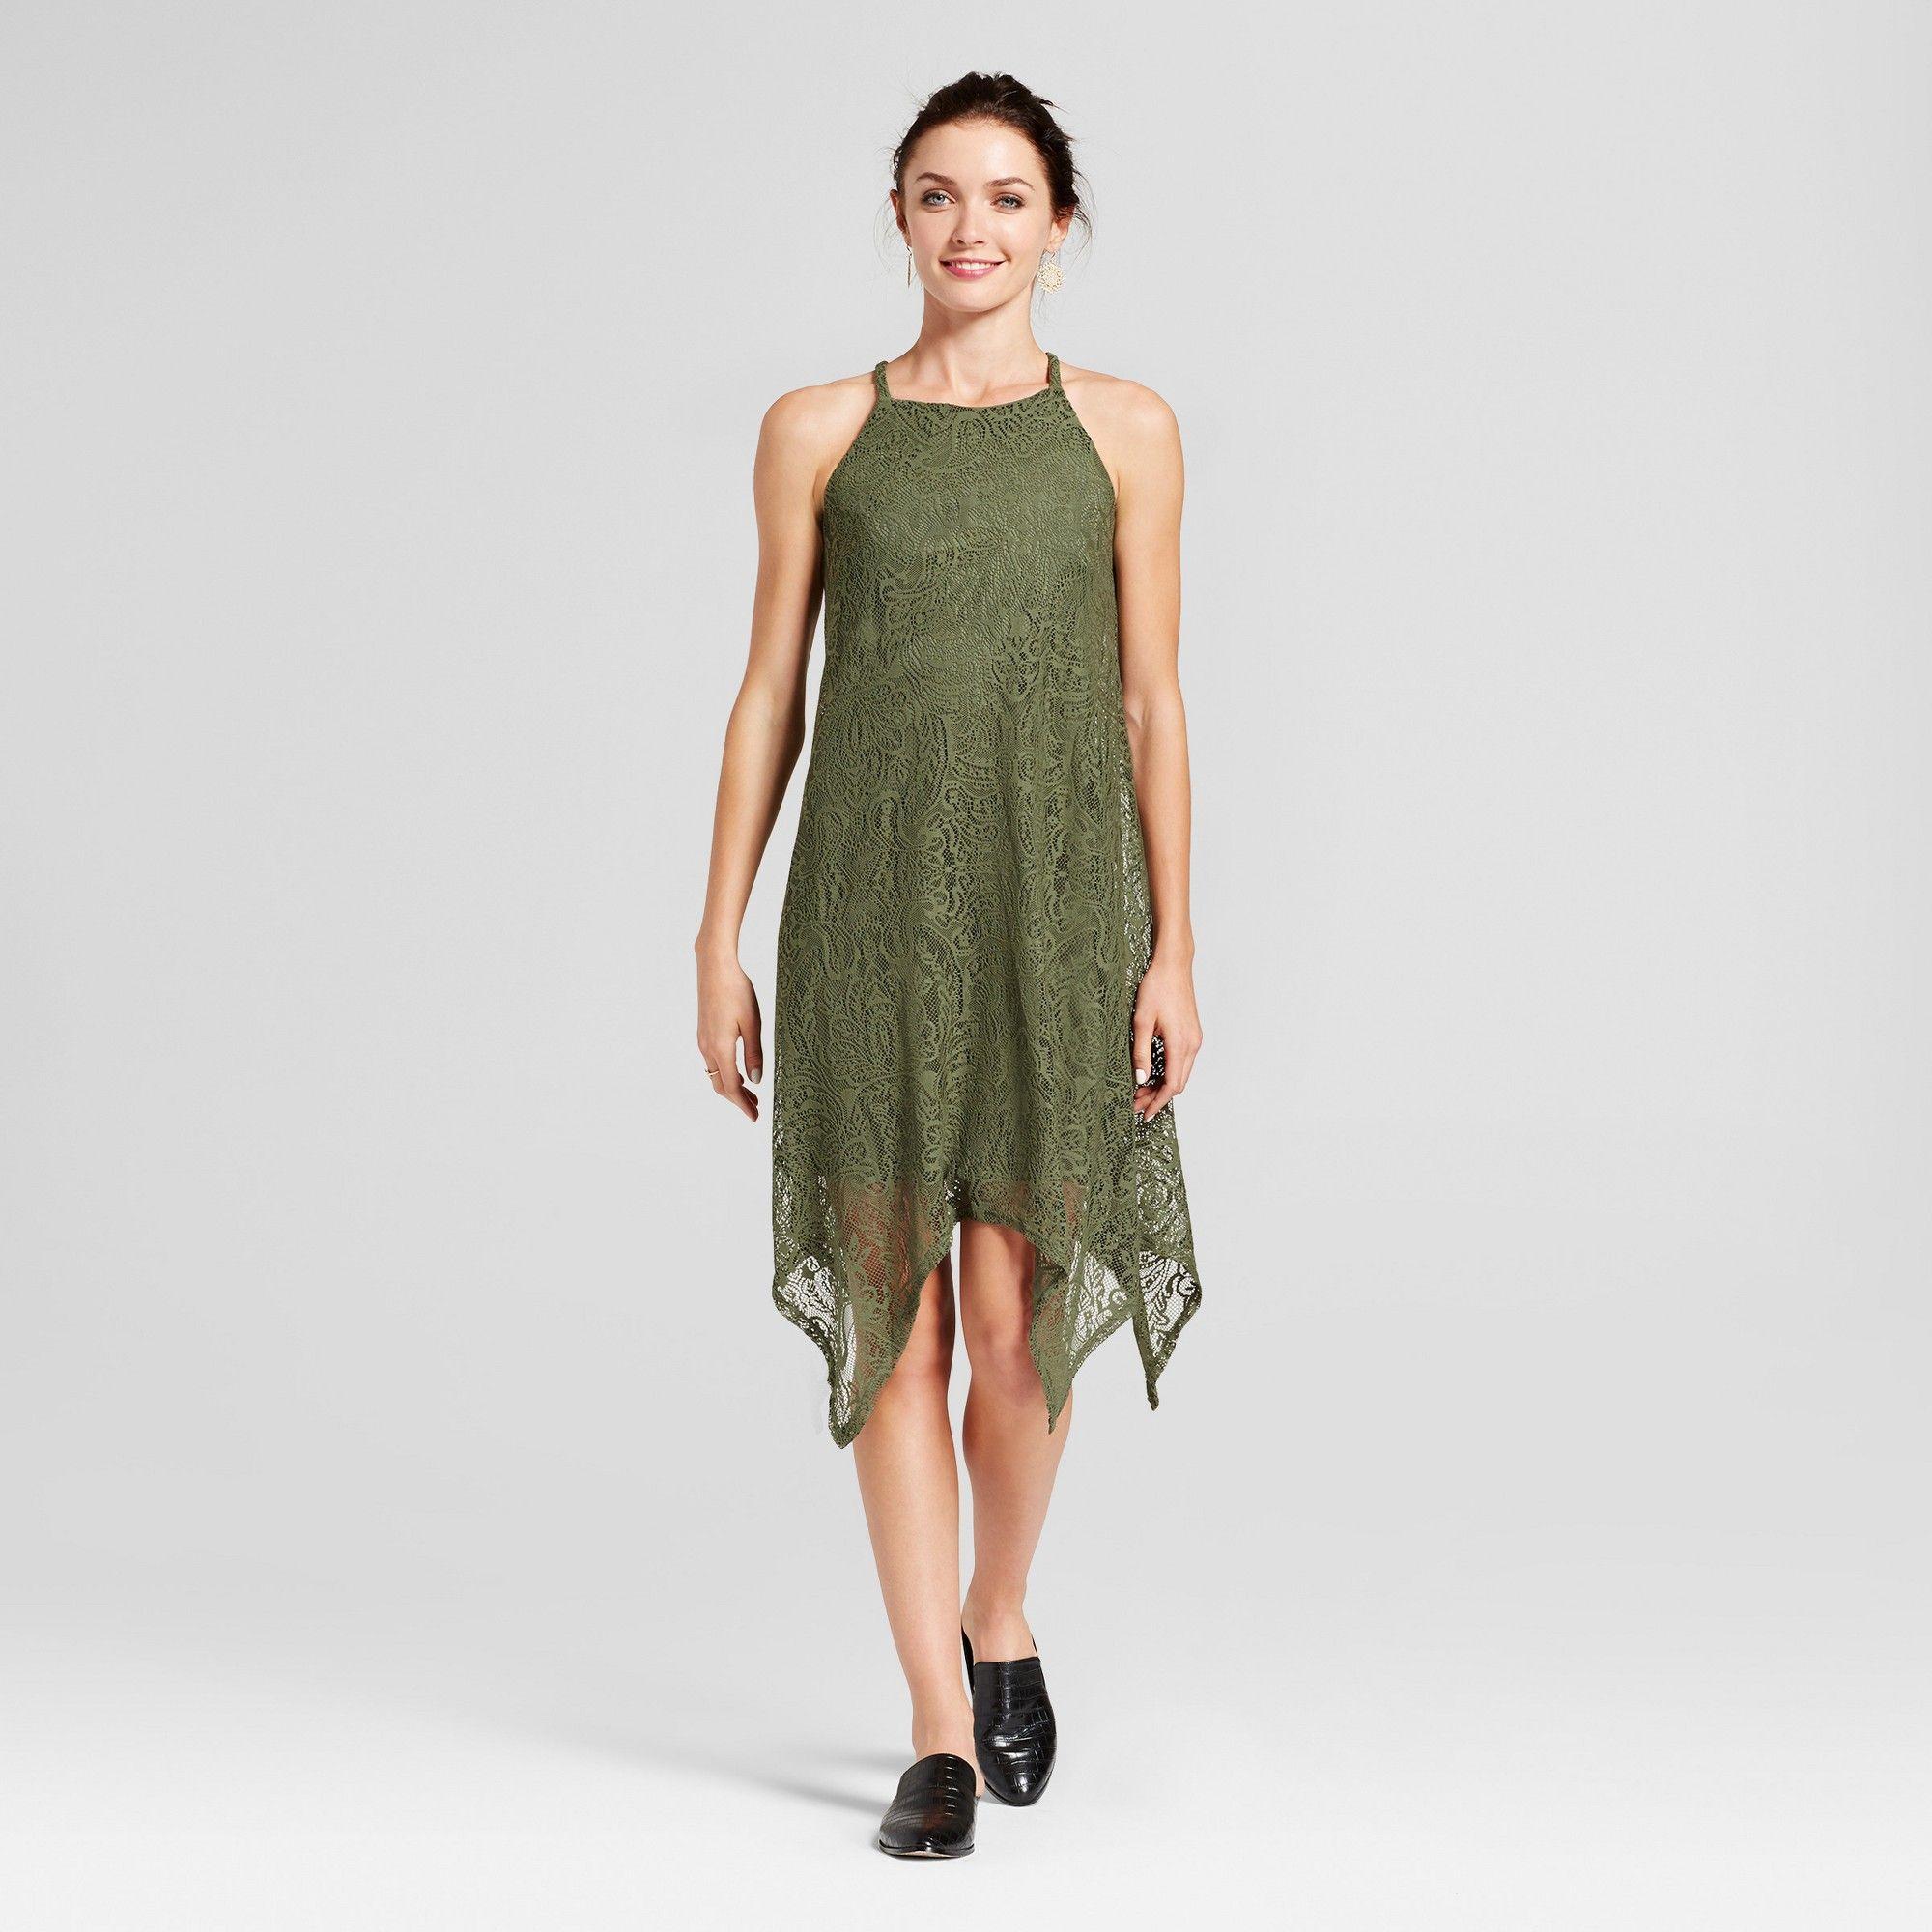 Women's Shark Bite Hem Lace Tank Dress Lux II Olive 16